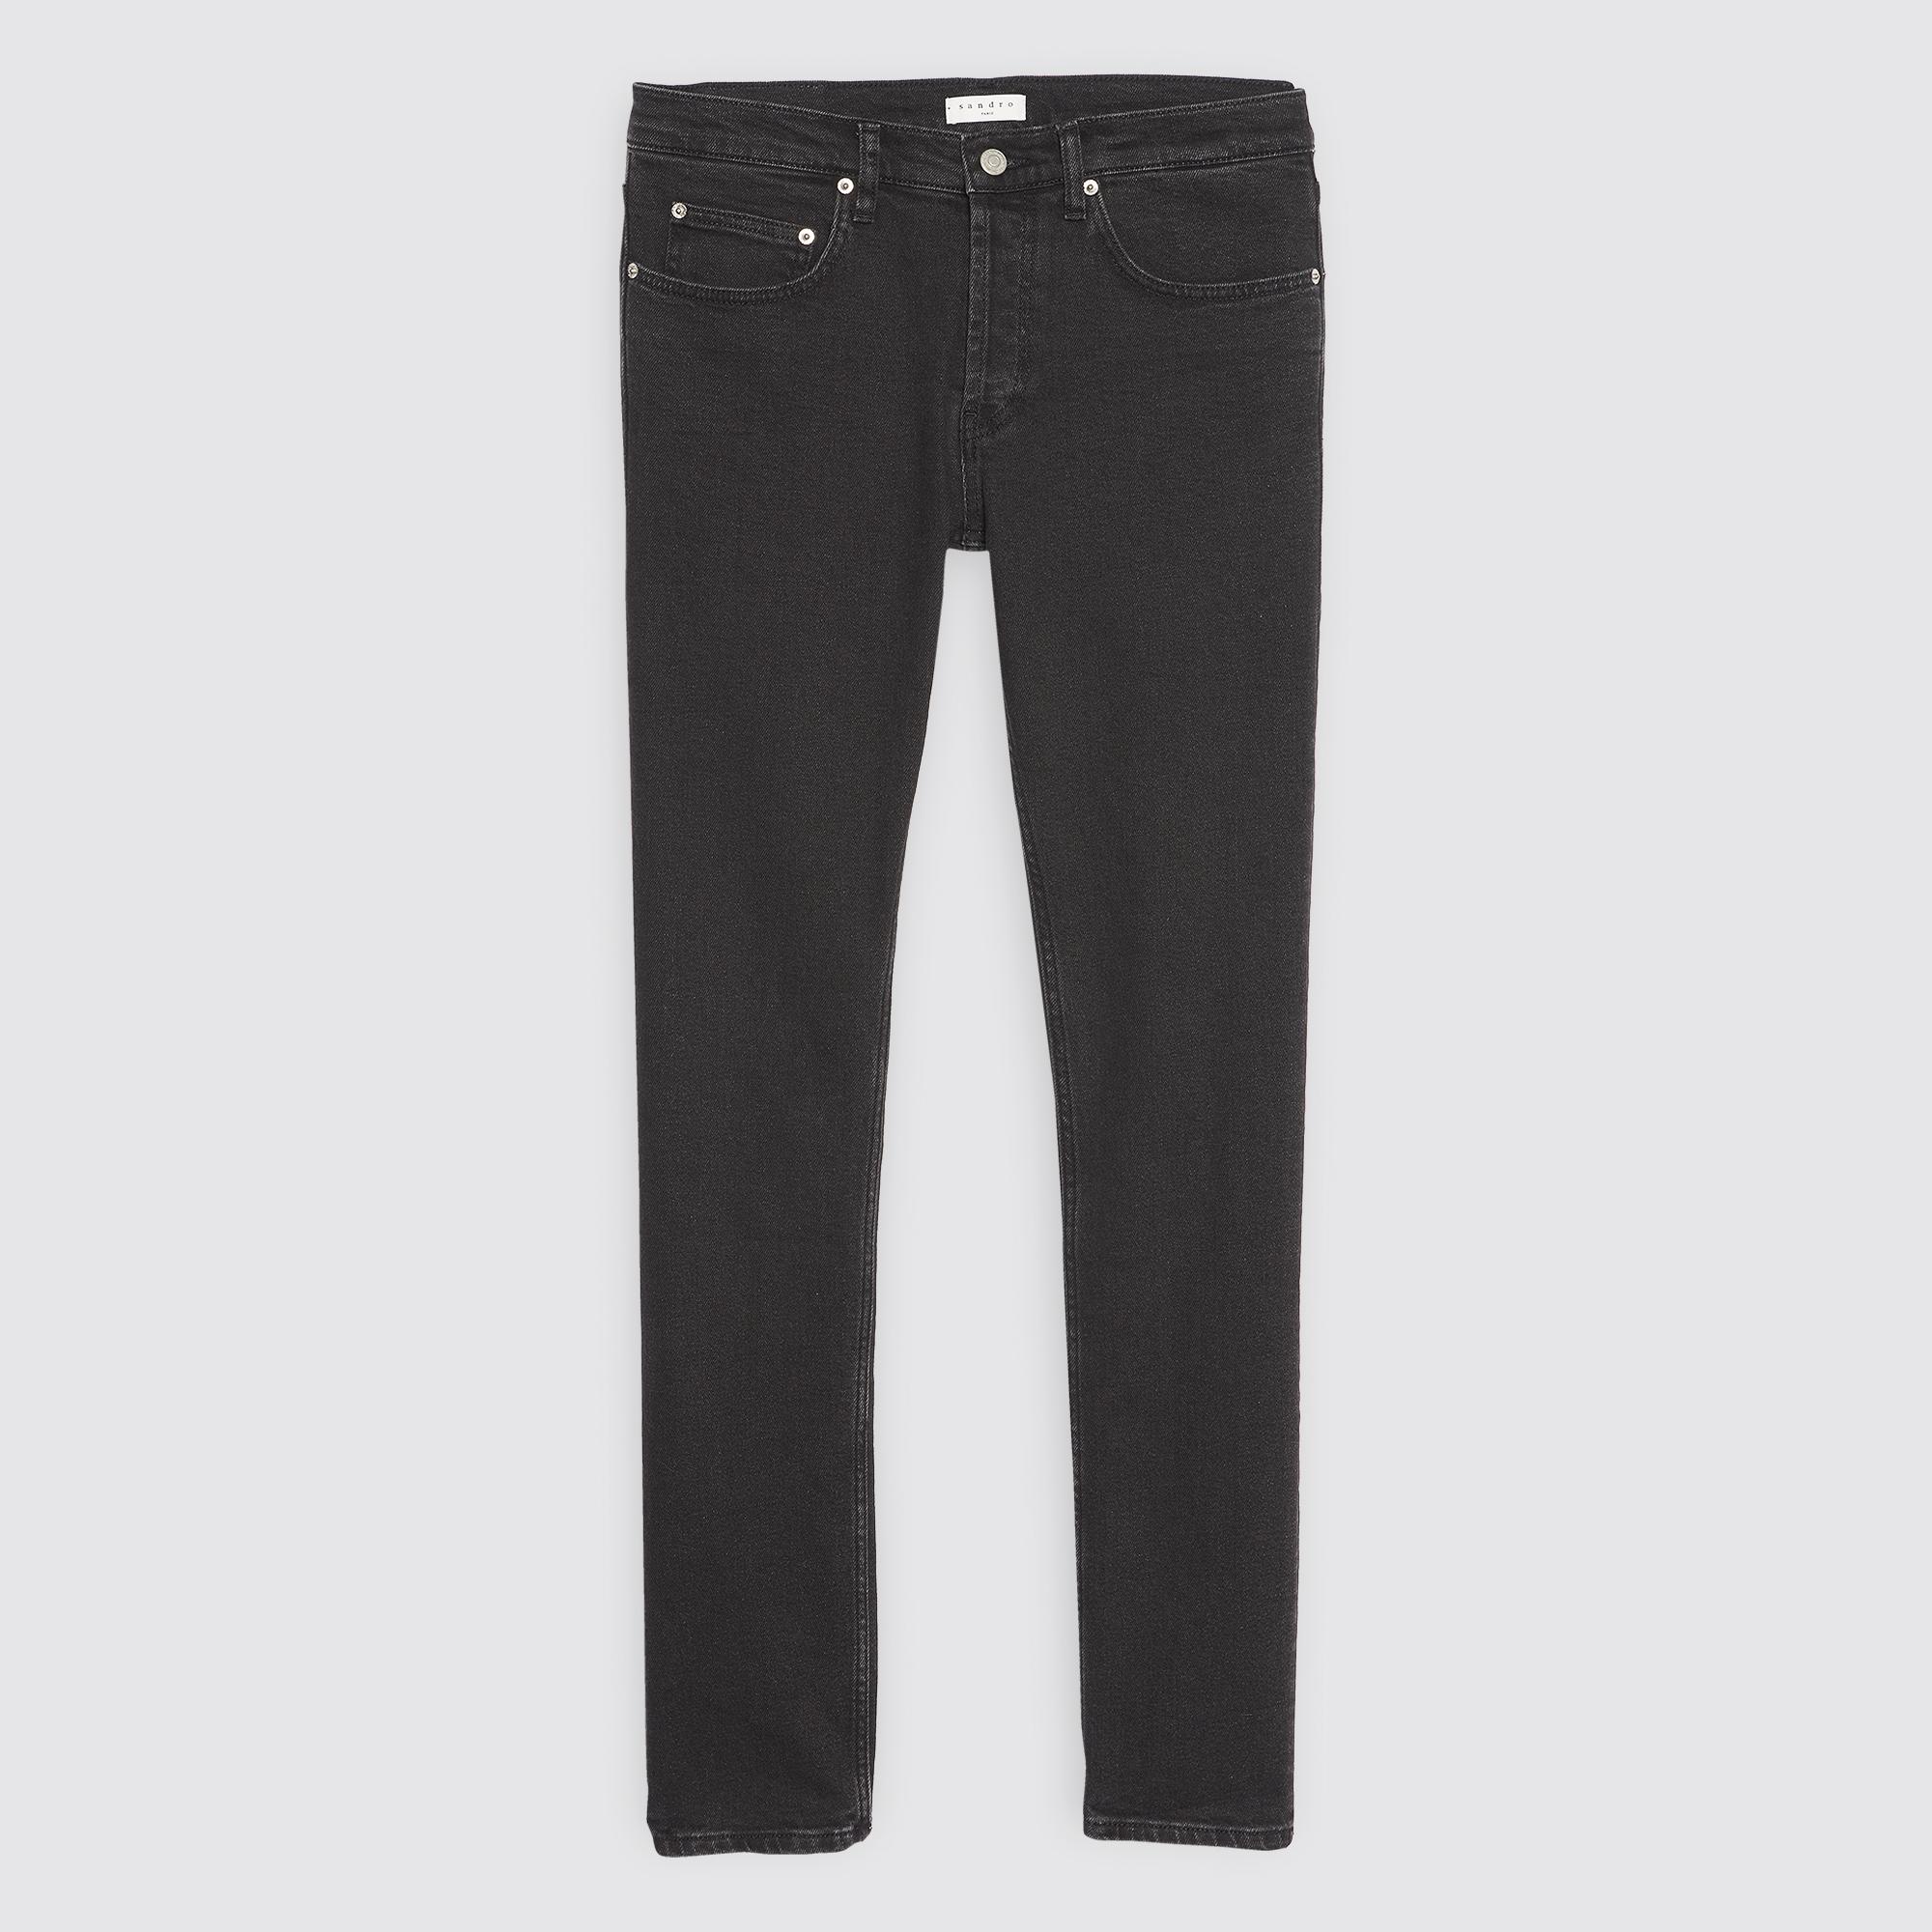 Jeans neri - Skinny : Jeans colore Nero